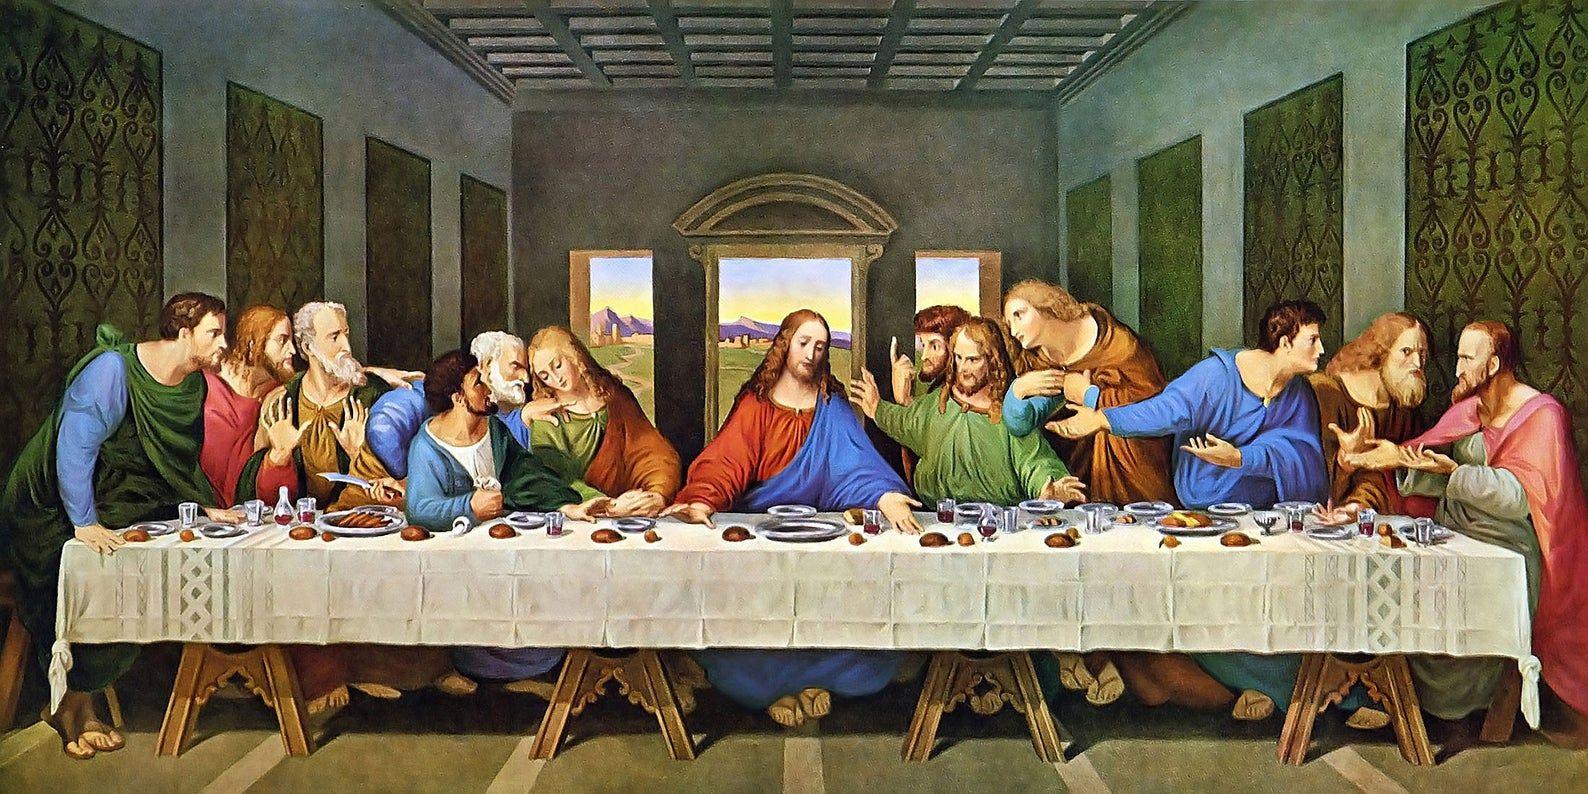 Leonardo Da Vinci S Fresco The Last Supper 144 Etsy Last Supper Art Last Supper Leonardo Da Vinci